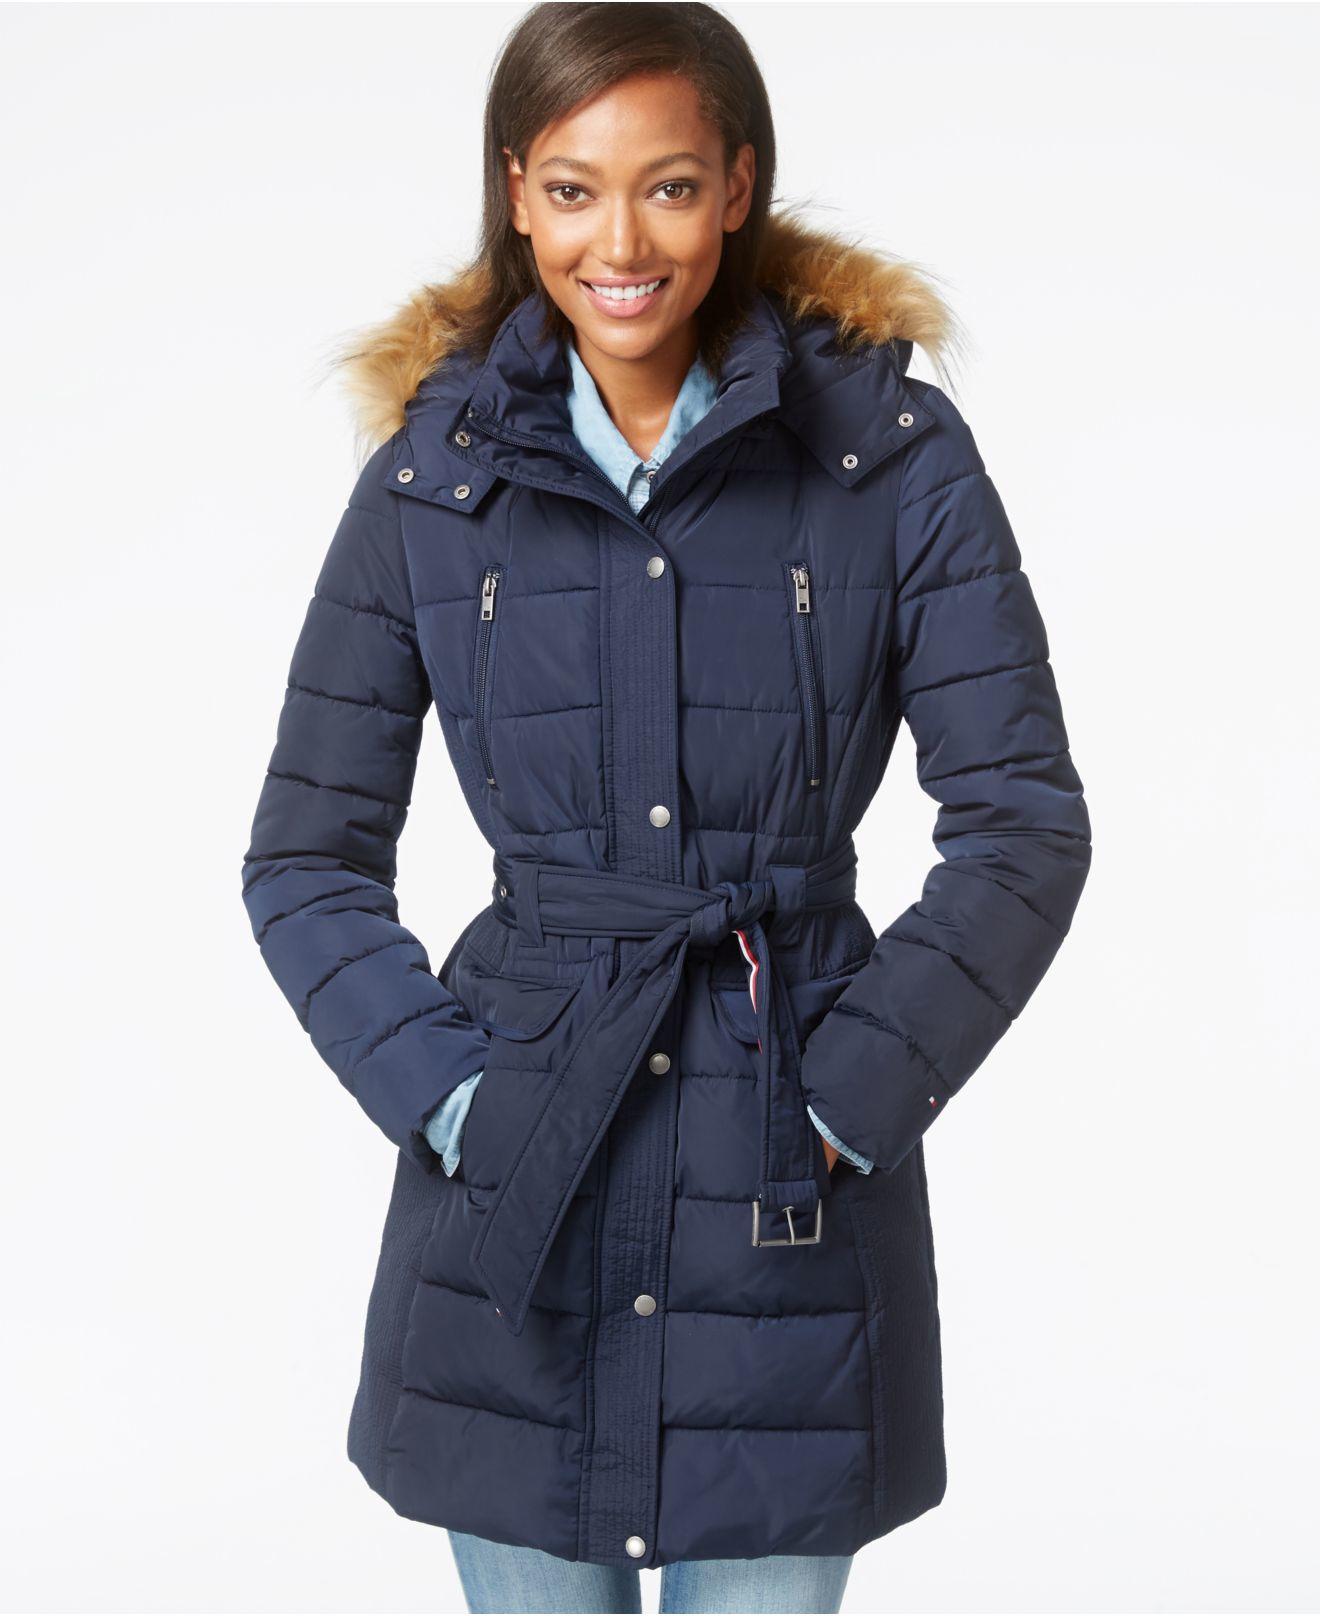 648573662c004 Lyst Tommy Hilfiger Faux Fur Trim Belted Puffer Coat In Blue